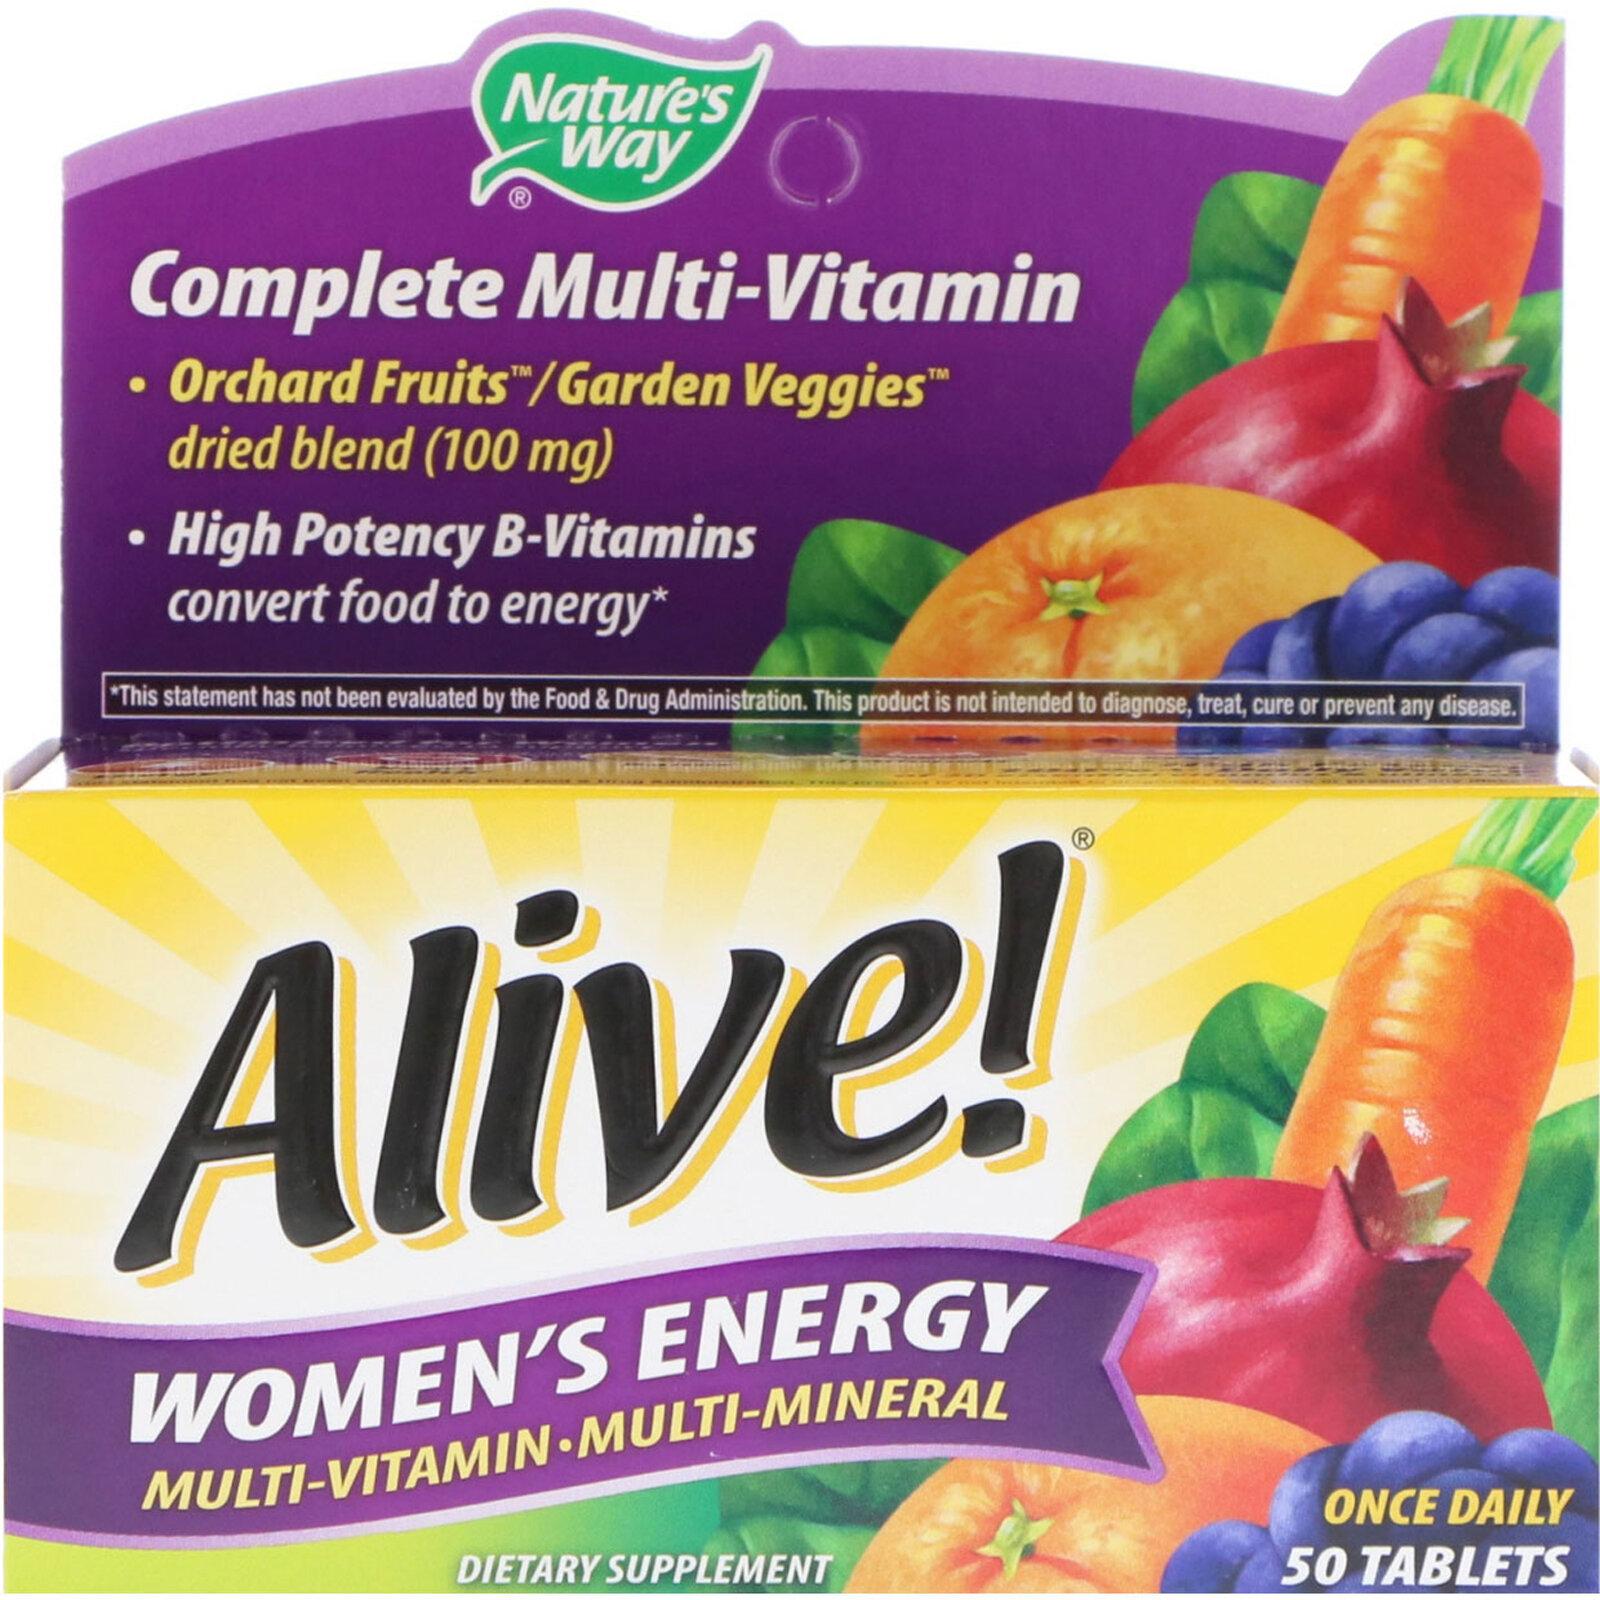 Nature's Way Alive! Женская Энергия, Мультивитамины - Мультиминералы, 50 таблеток